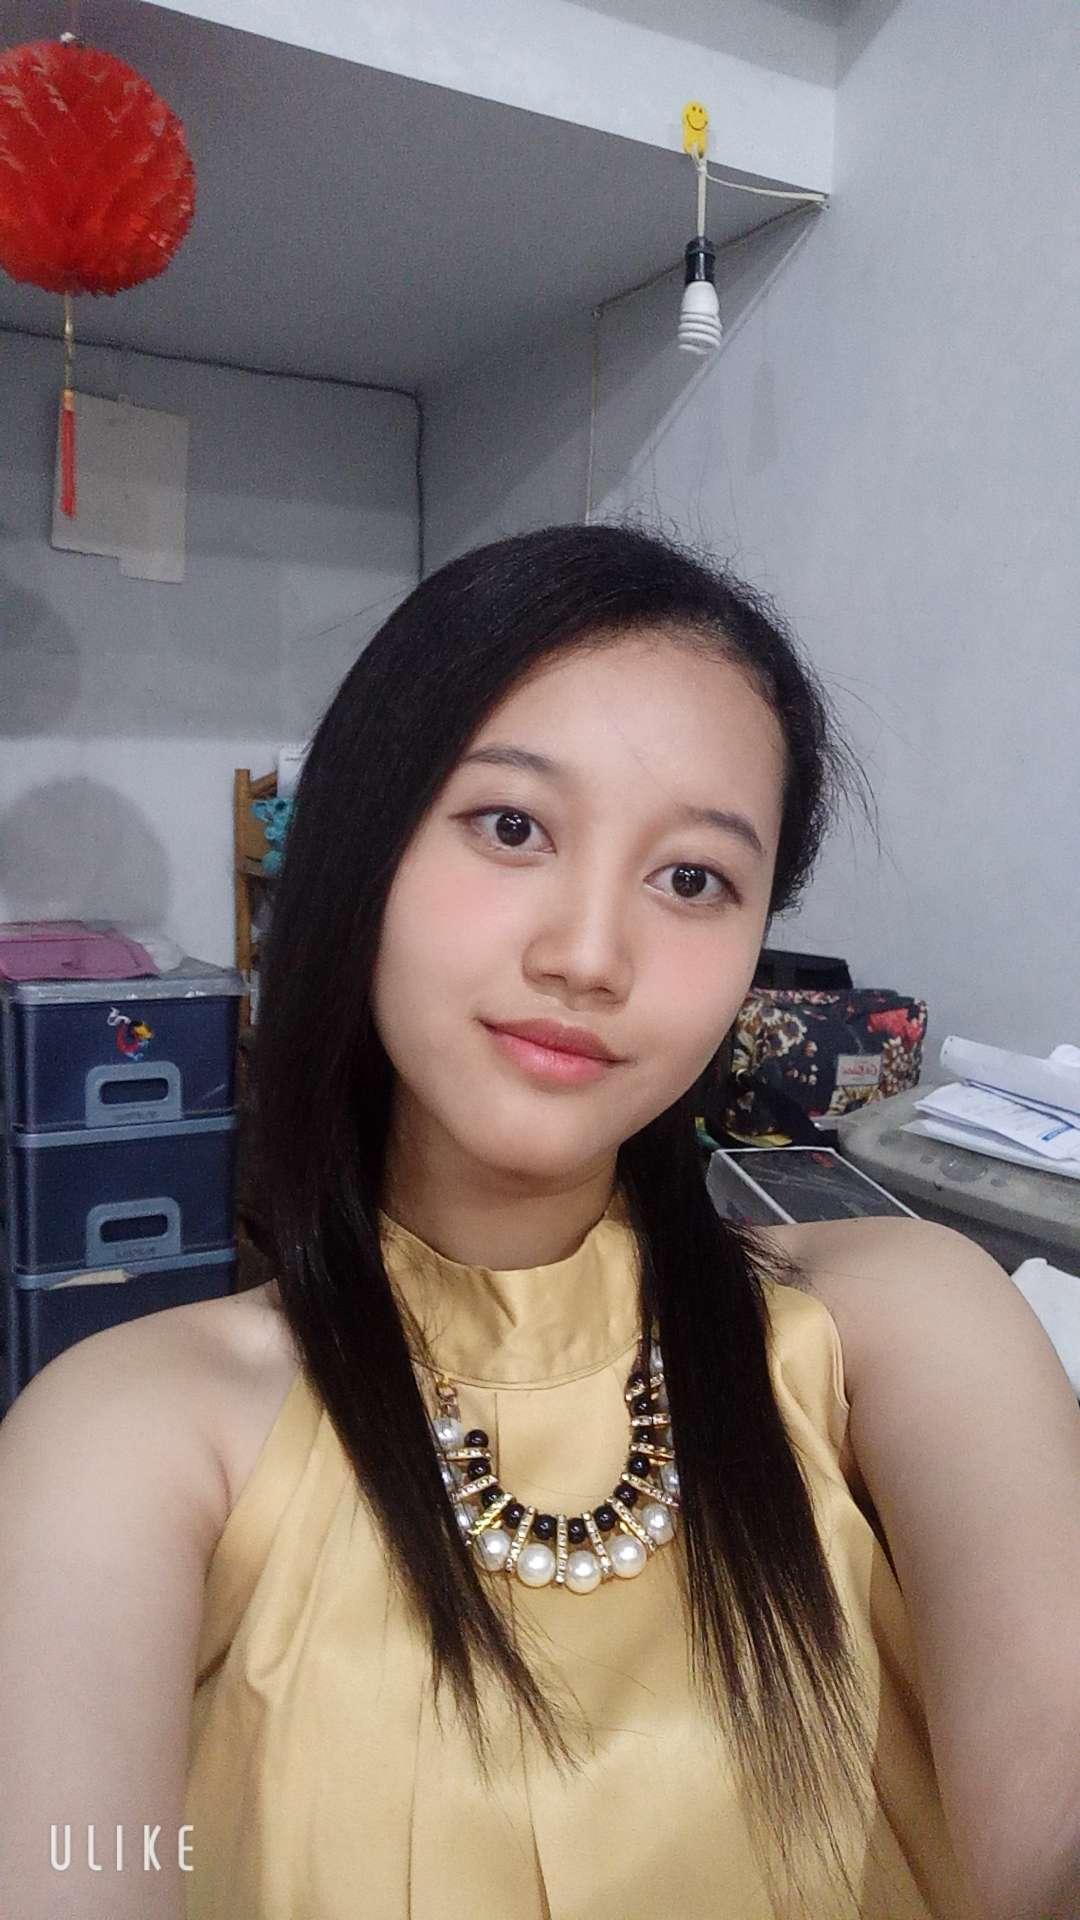 beauty_20181020180735